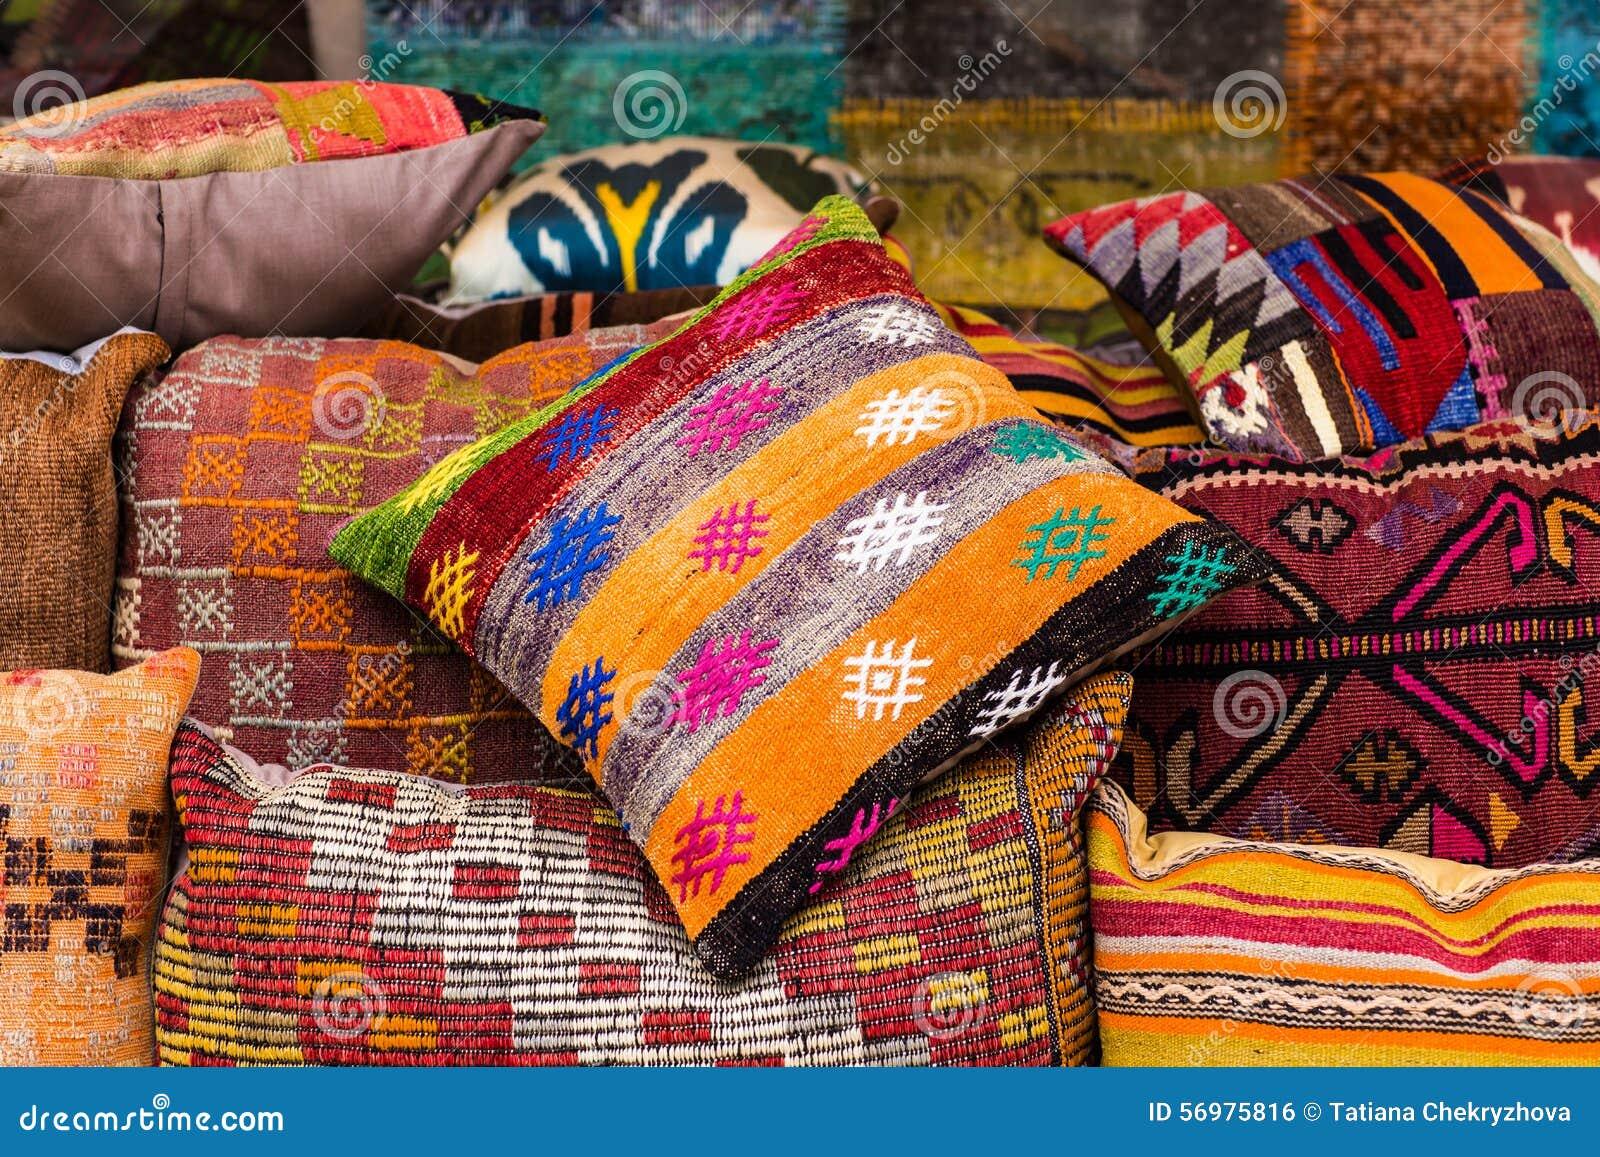 cuscini orientali fotografia stock immagine 56975816. Black Bedroom Furniture Sets. Home Design Ideas